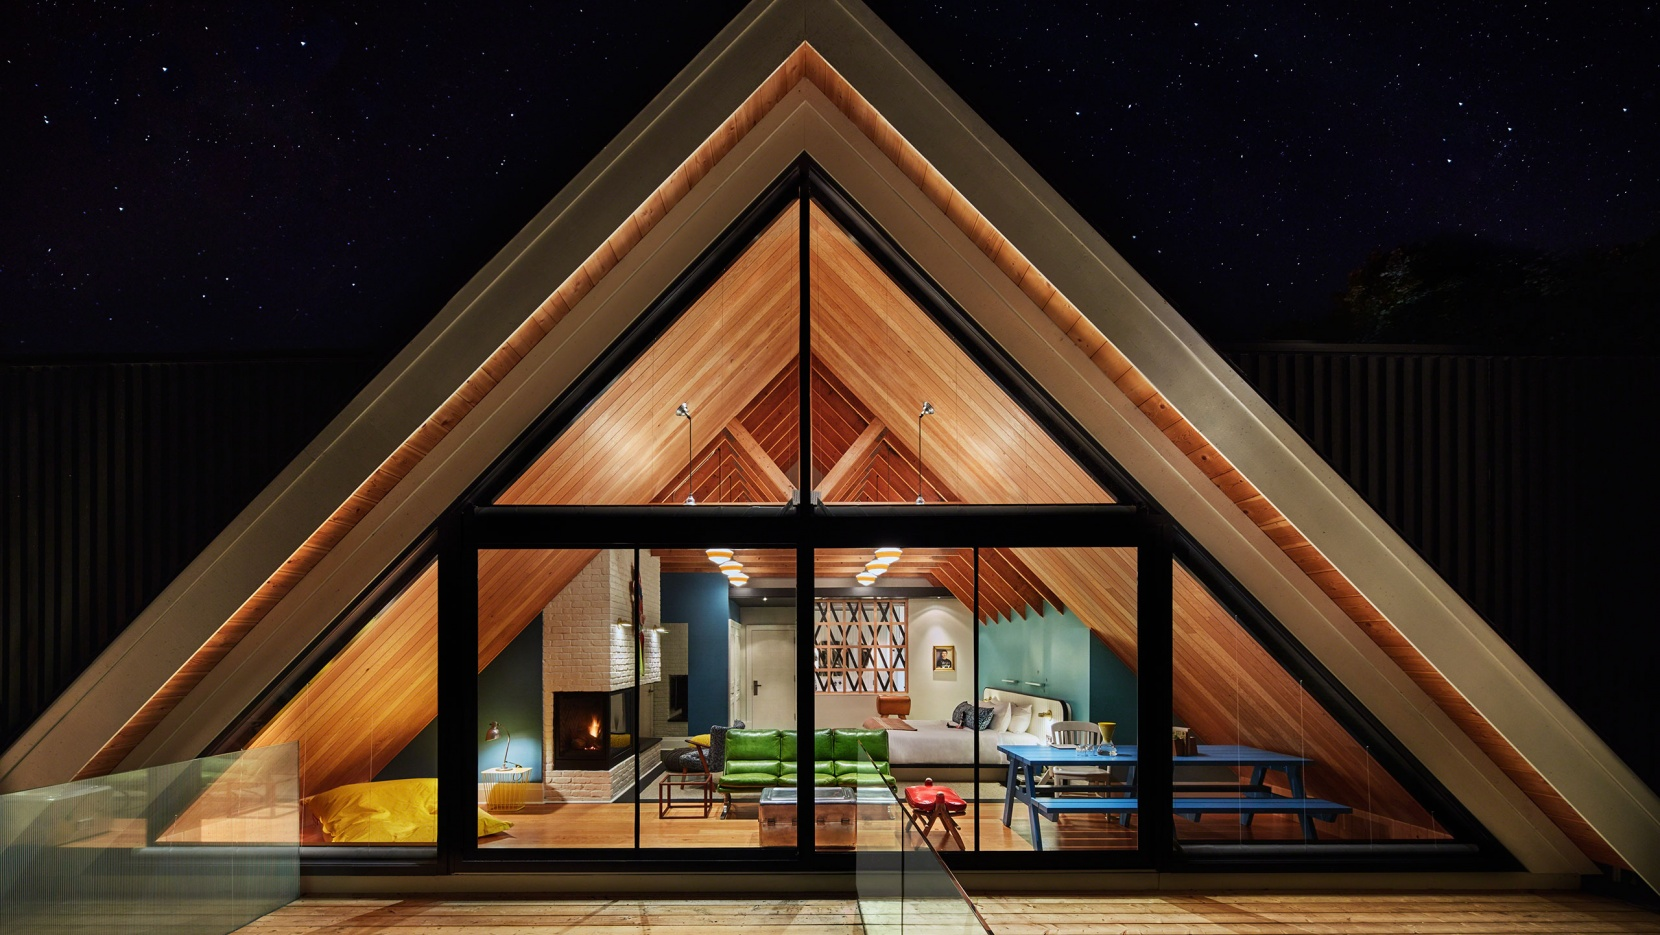 фасад треугольного дома